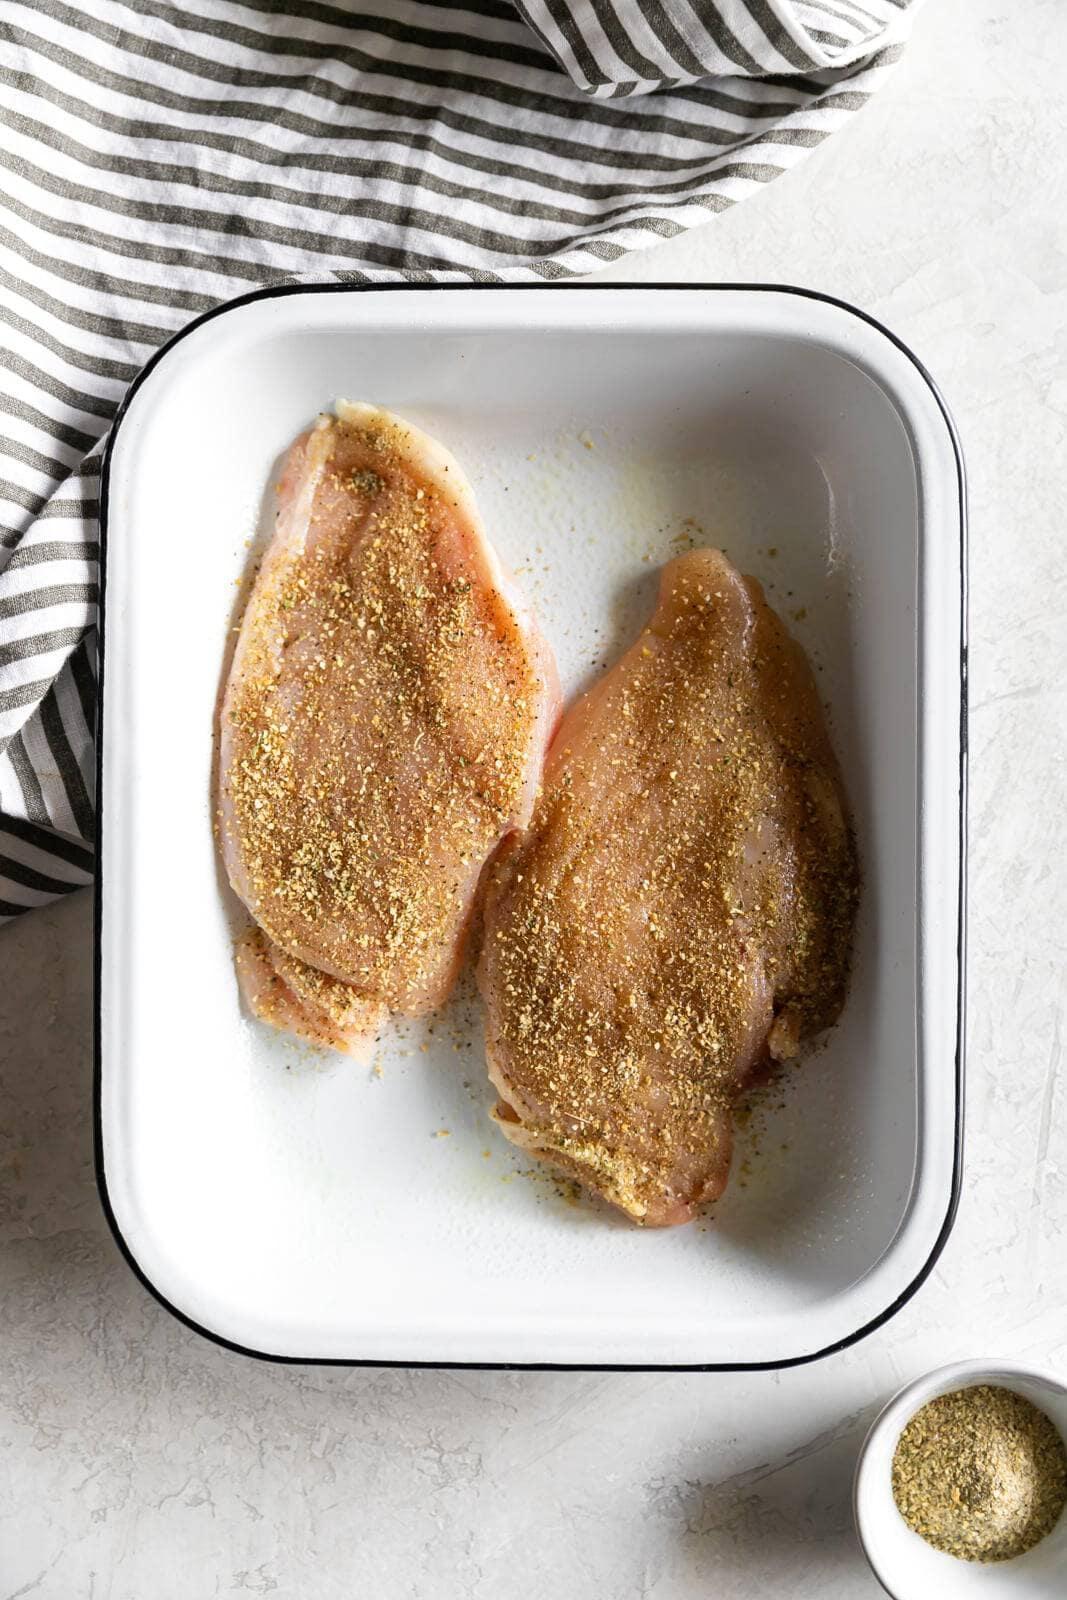 Two seasoned chicken breasts inside cooking pan